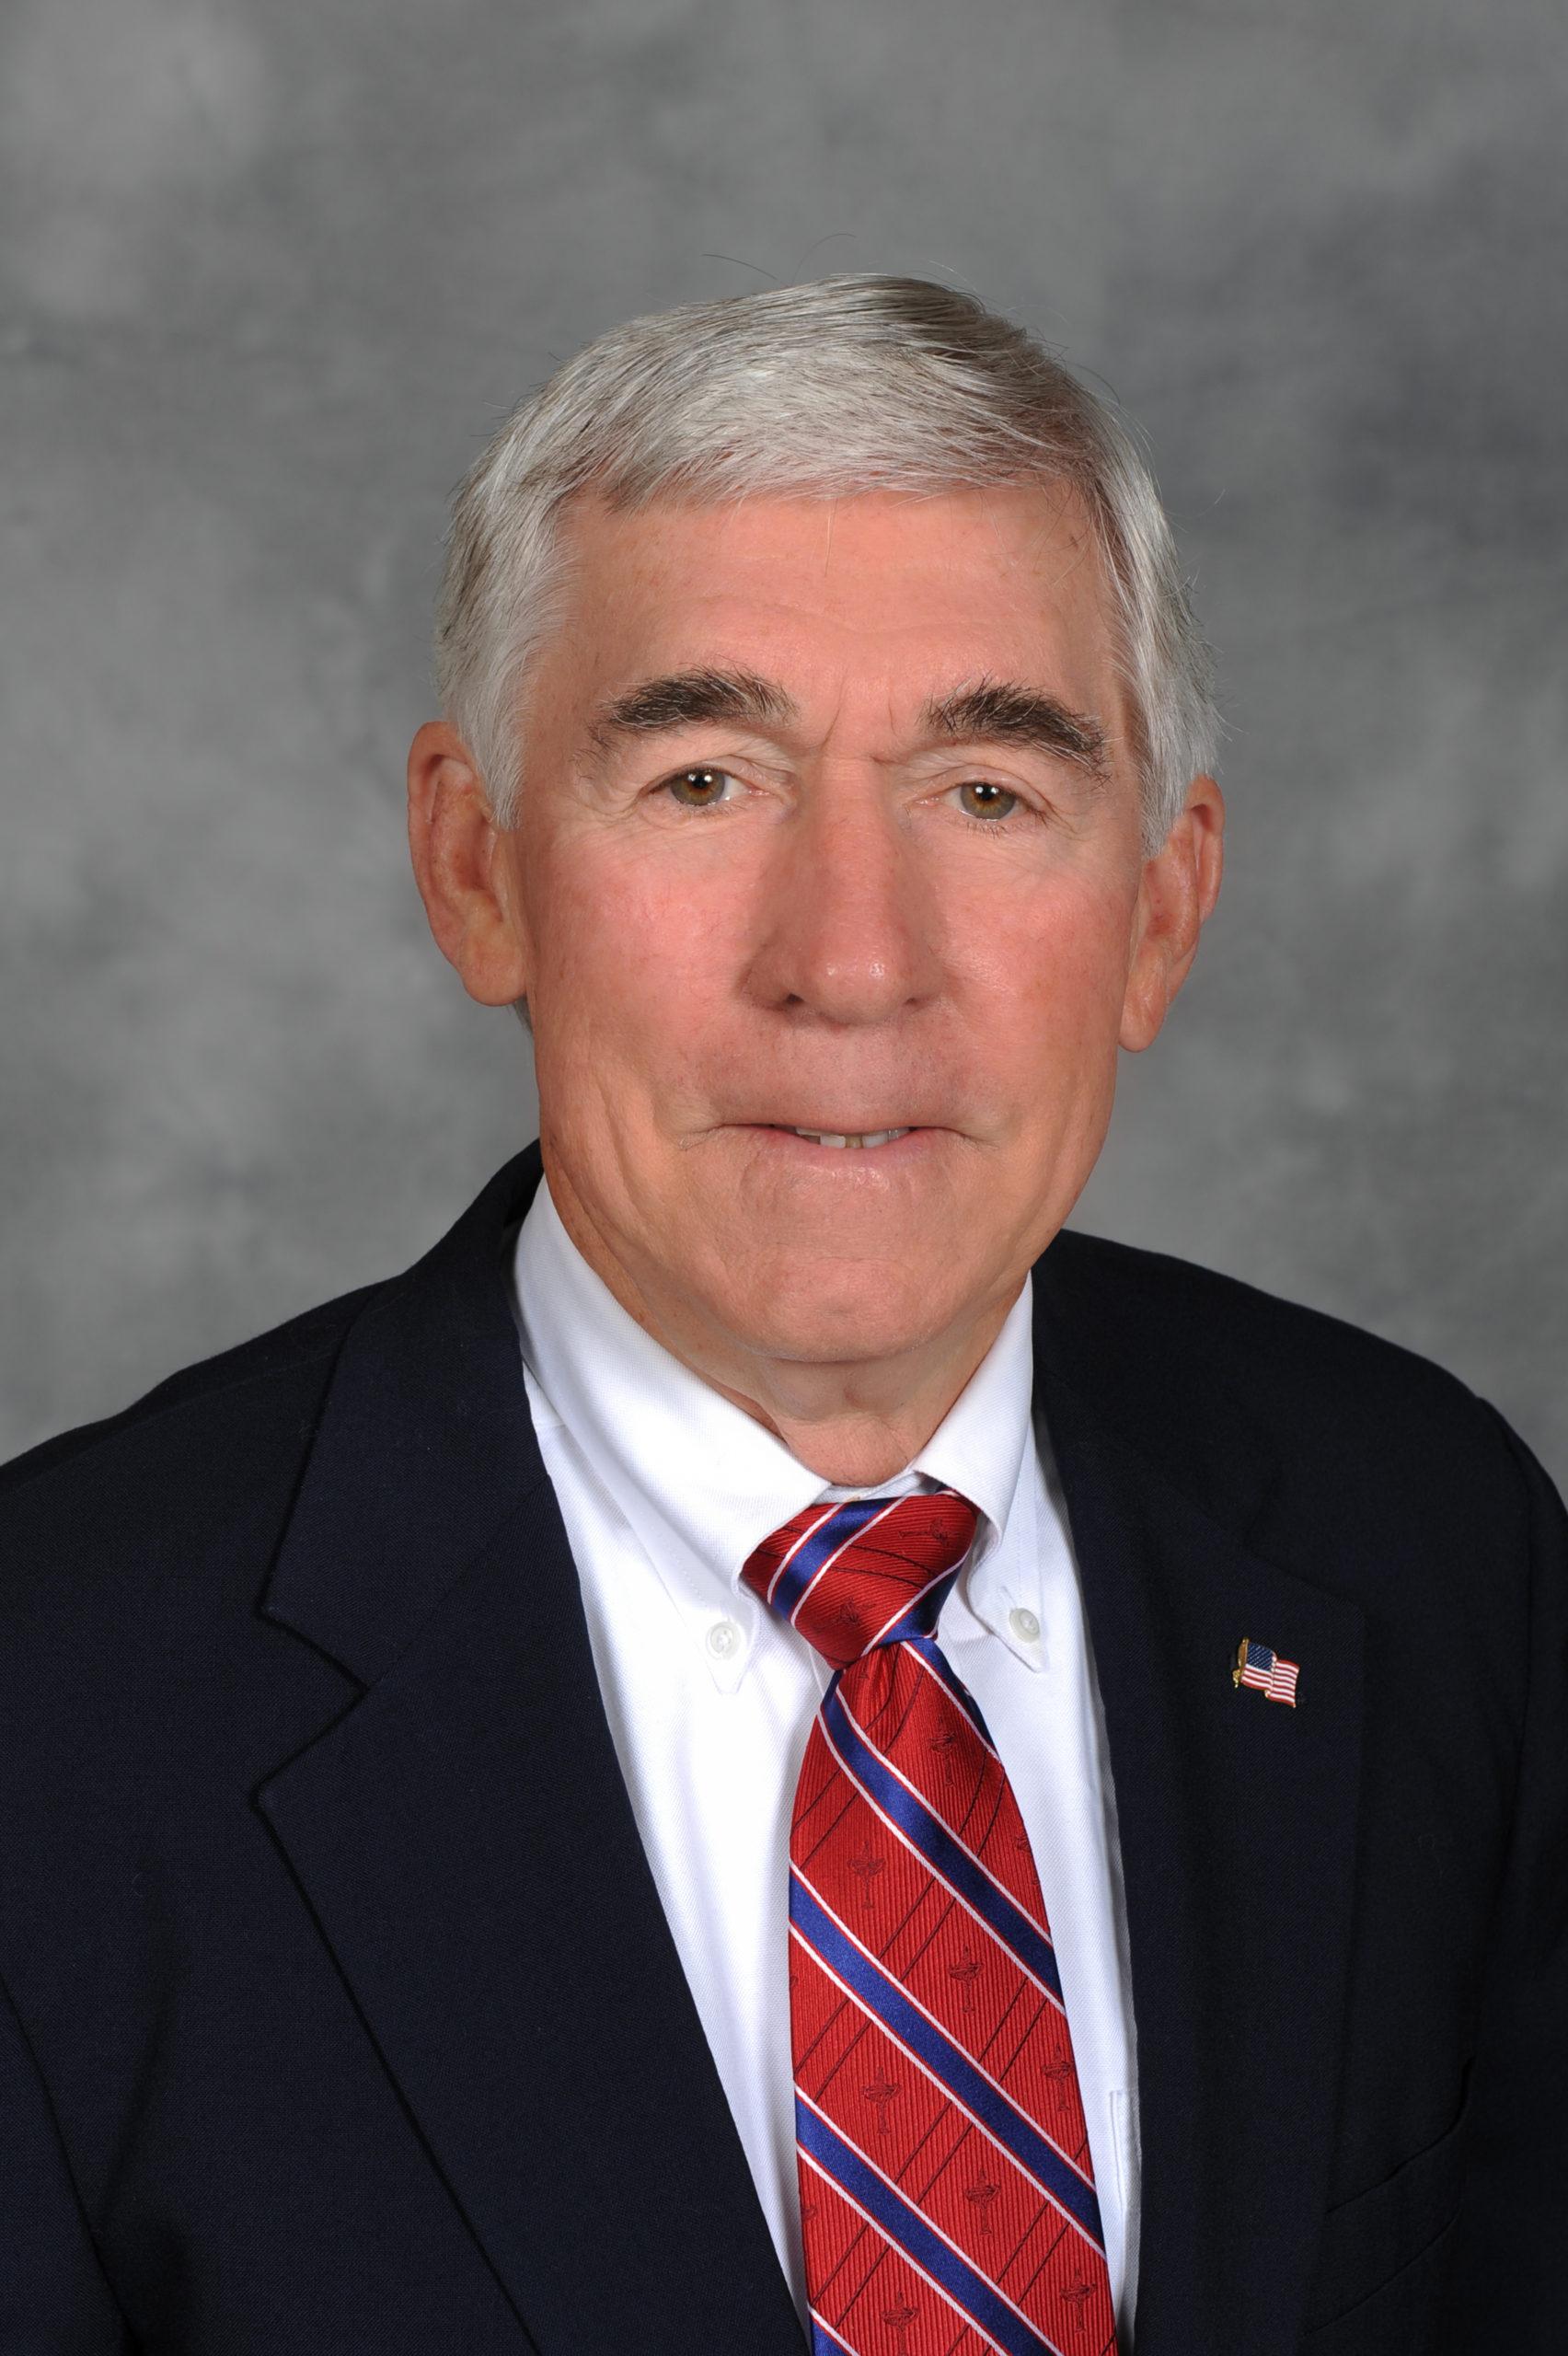 Charles M. Thrash, Former Carolina Trust Federal Credit Union Board Chairman (2001-2019) And Former Director Of The Professional Golf Management Program At Coastal Carolina University (2002-2013)